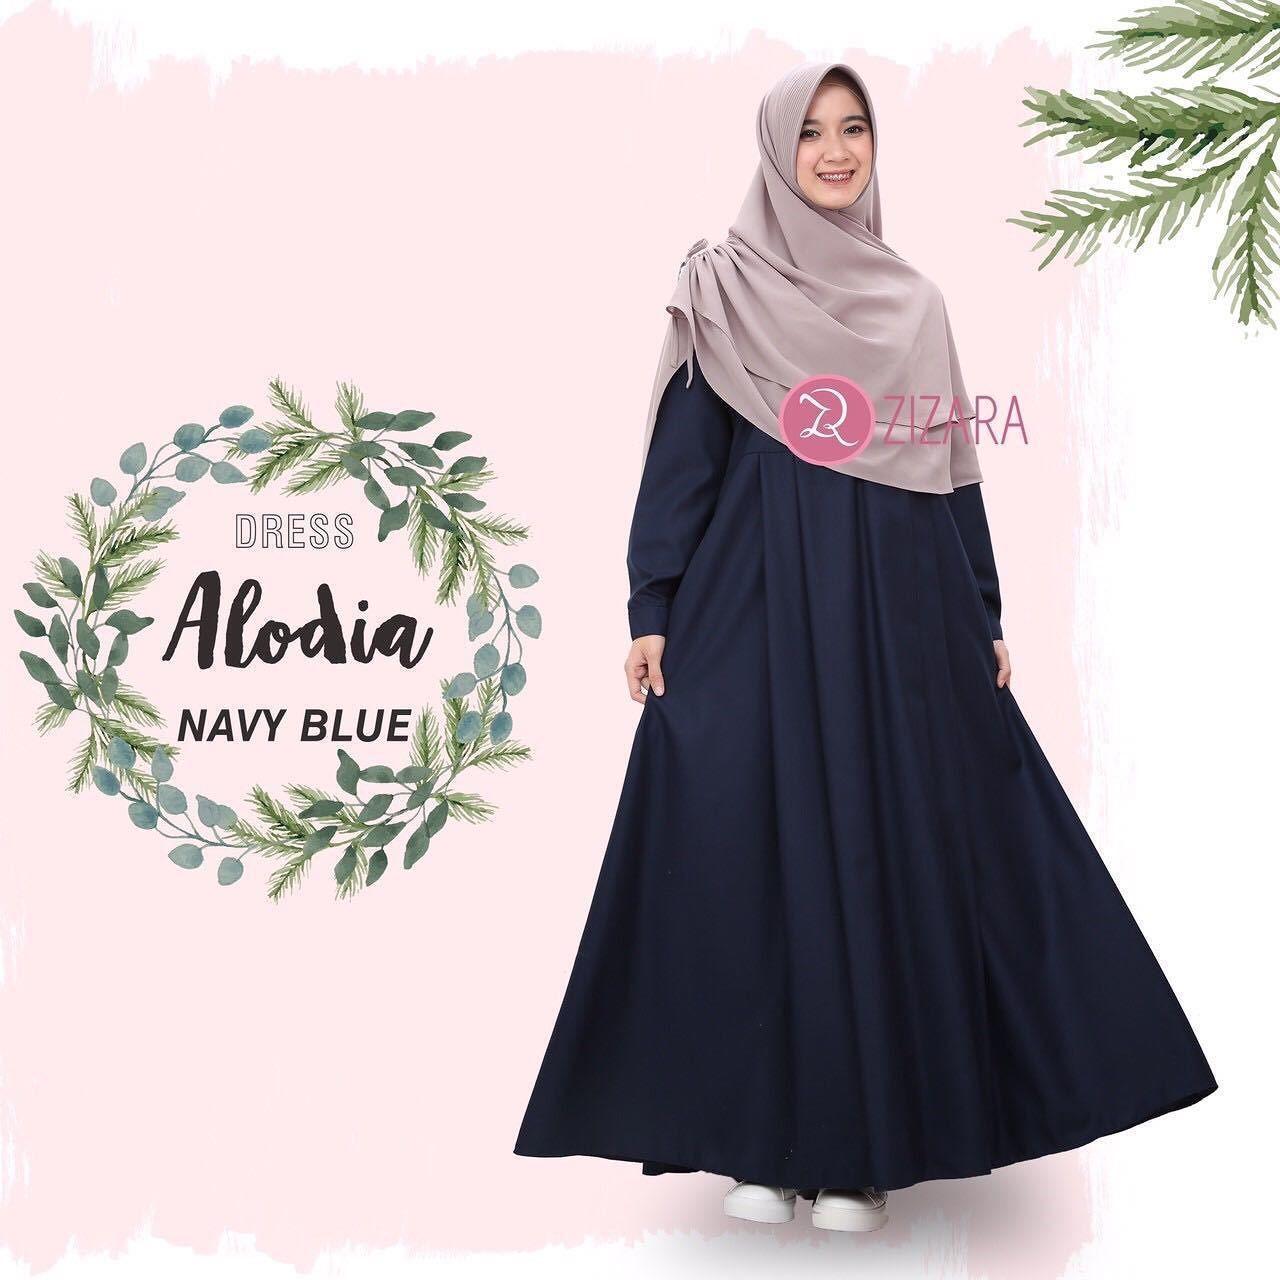 Gamis Zizara Alodia Dress Navy Blue - baju muslim wanita baju muslimah Kini  hadir untukmu yang a531640dbc